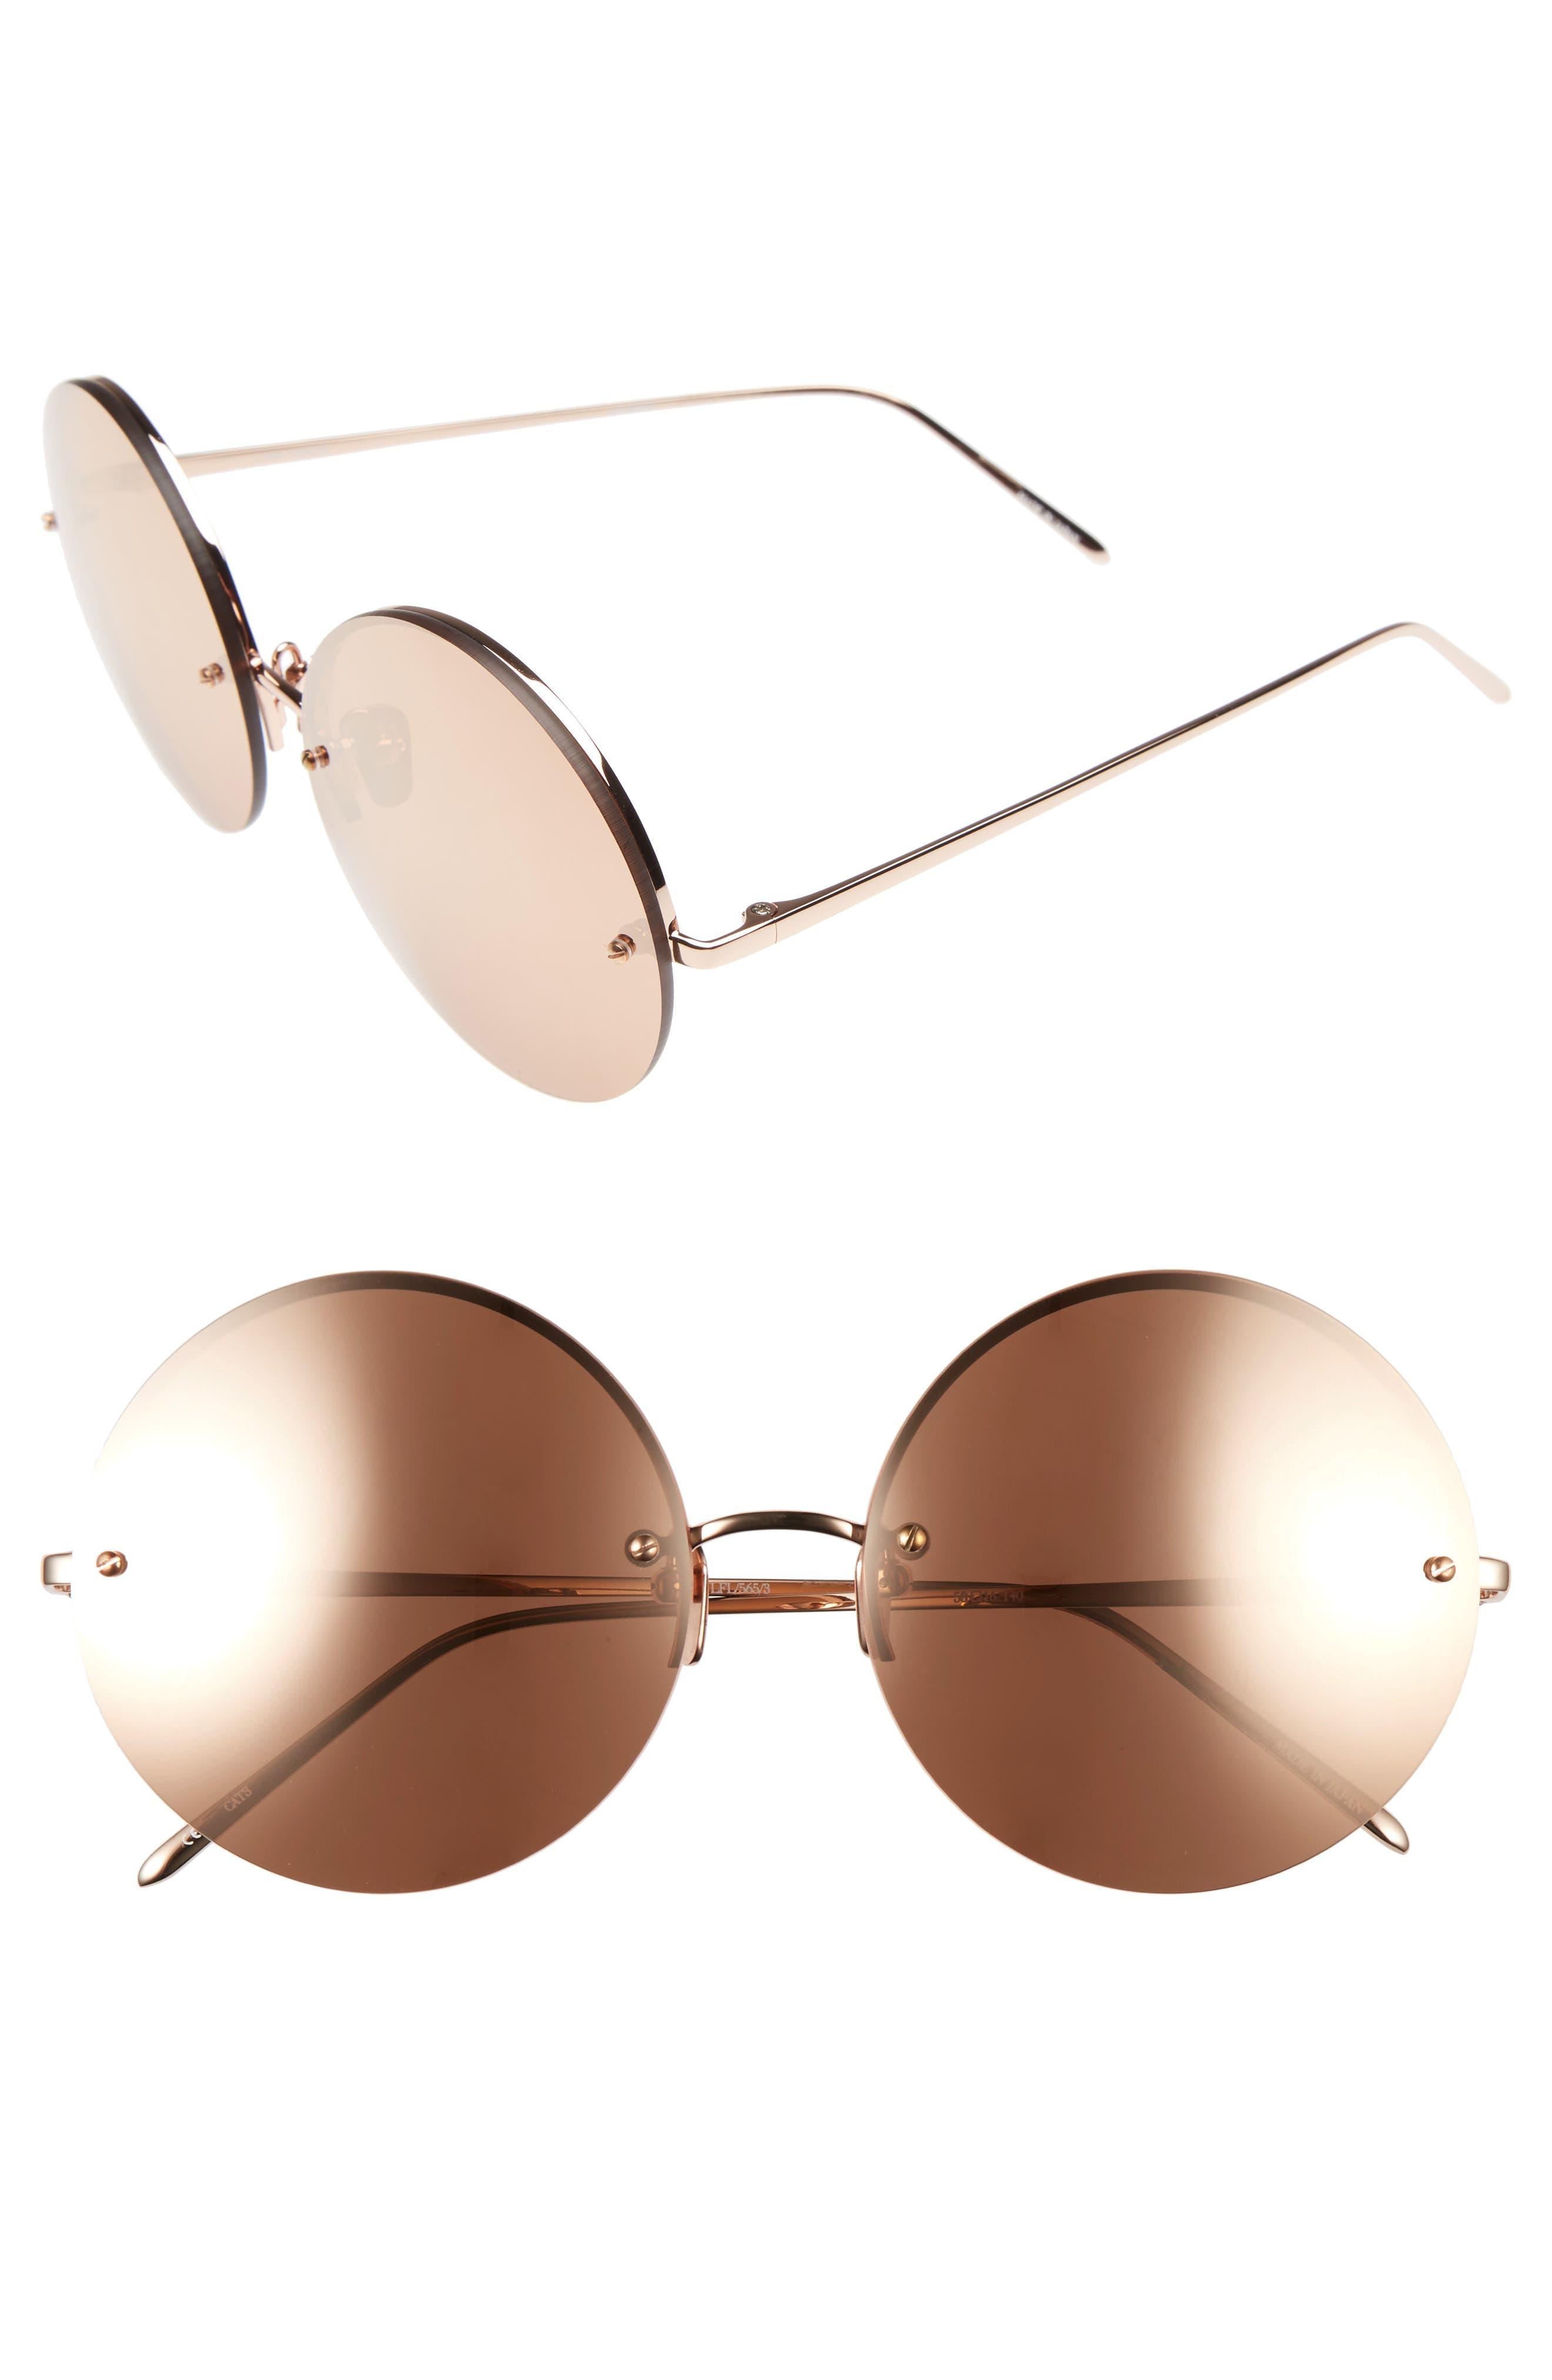 Alternate Image 1 Selected - Linda Farrow 58mm 22 Karat Gold Trim Rimless Round Sunglasses